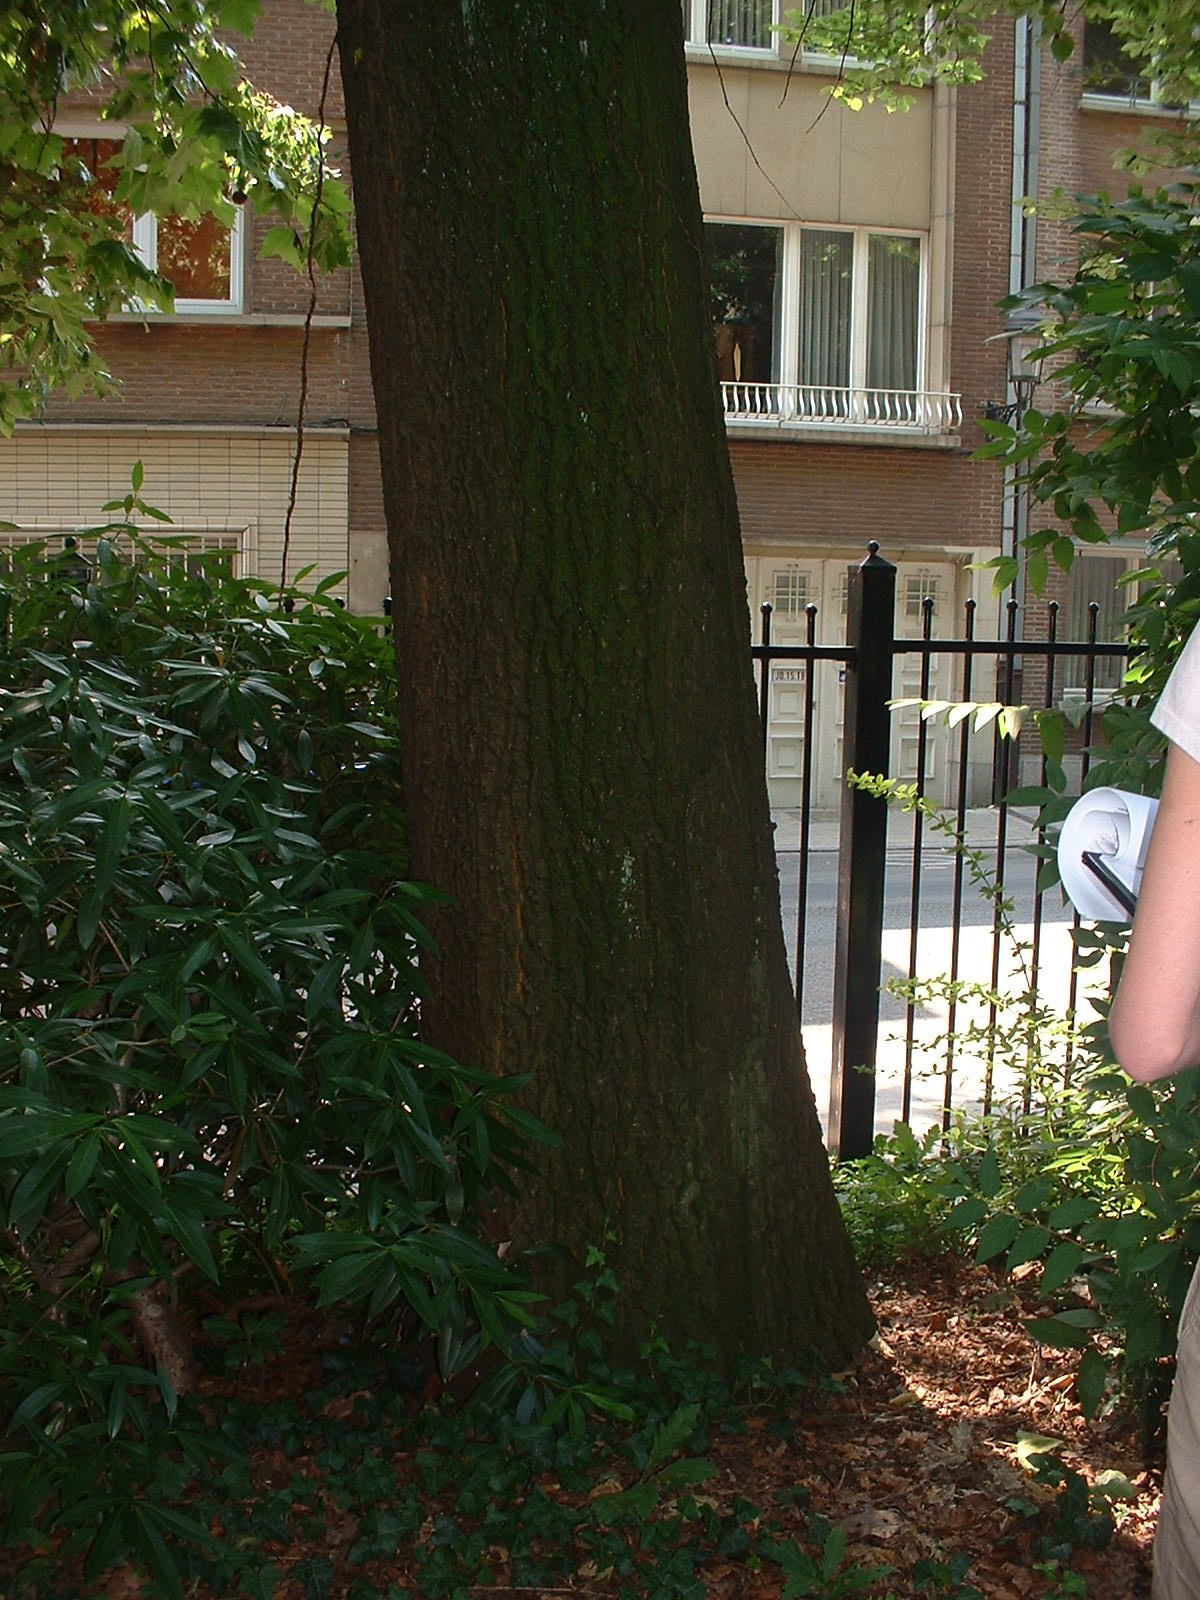 Chêne à cupules chevelues – Jette, Parc Garcet, Rue Gustave Van Huynegem –  13 Juillet 2005